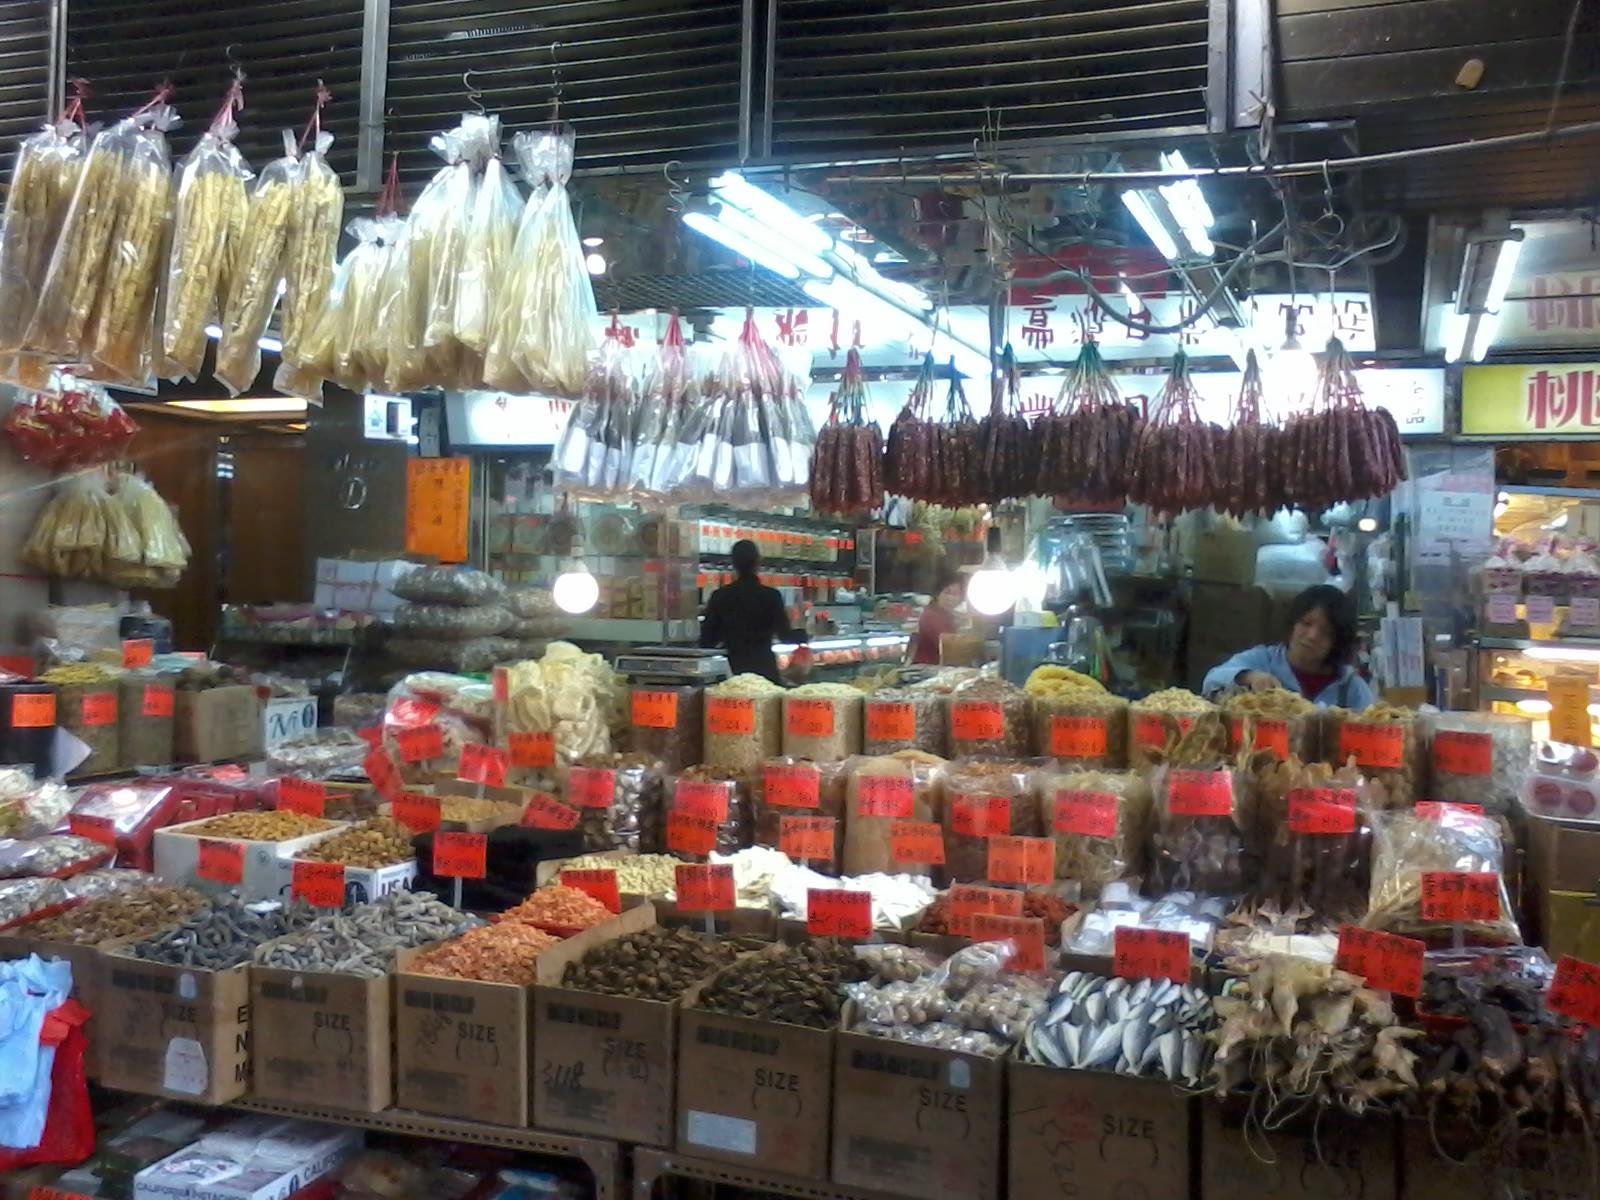 Chinese Food Shop Shop Chinese Food 23-jan